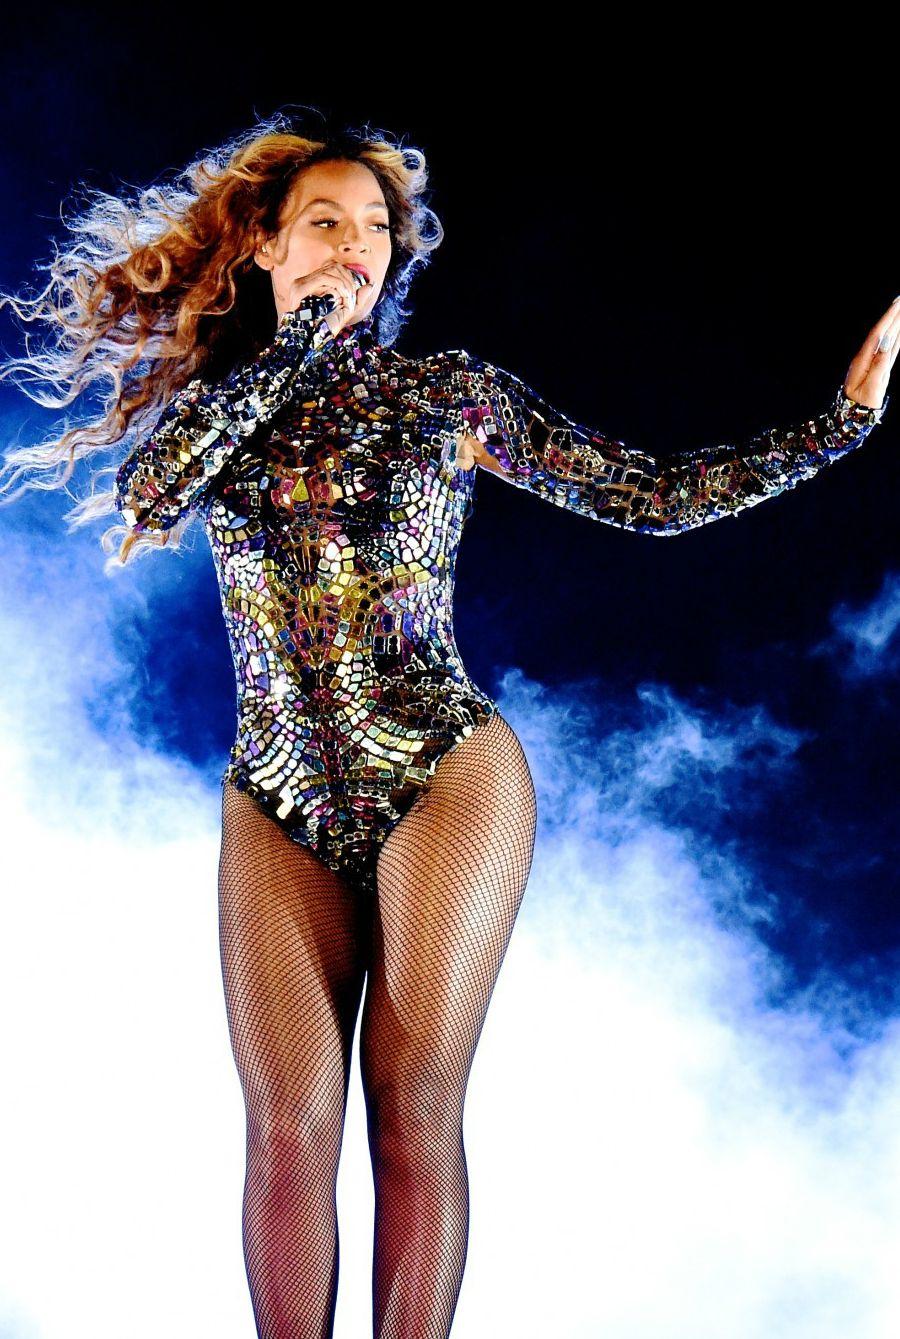 Beyonce The Mrs Carter Show World in Boston, Massachusetts